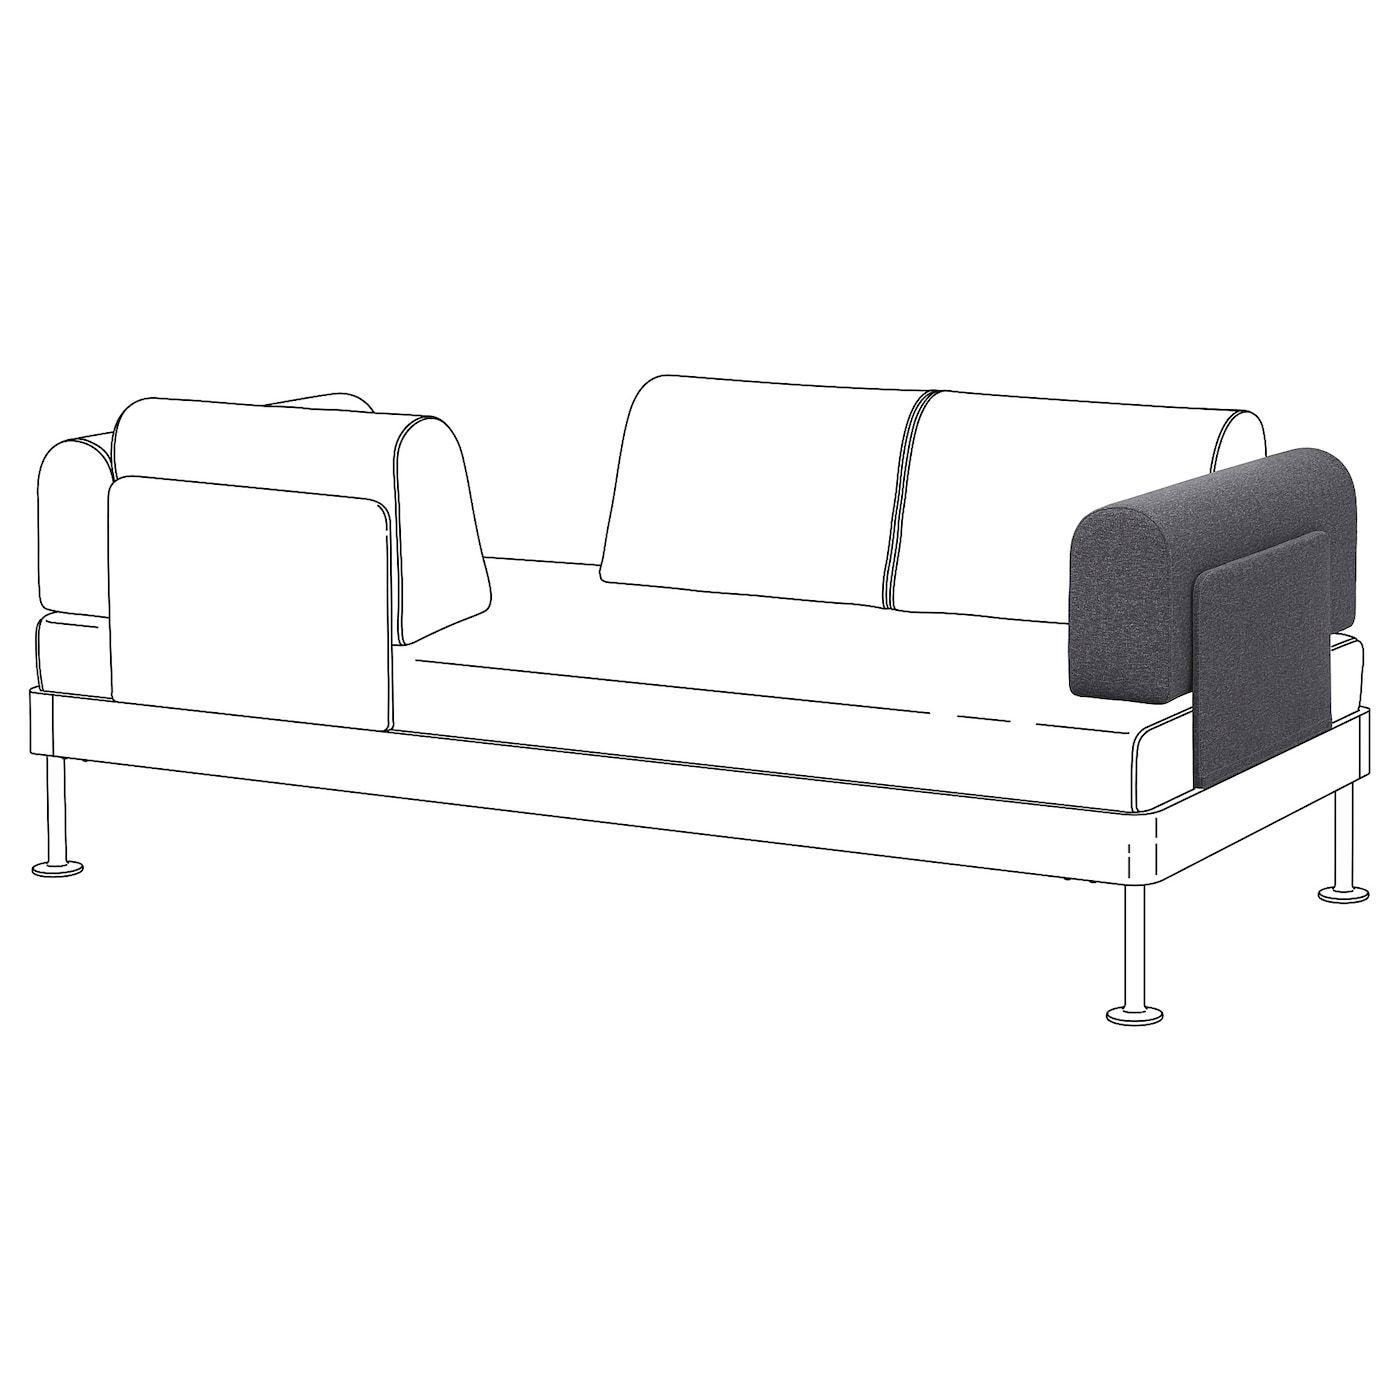 Delaktig Armrest With Cushion Gunnared Medium Gray In 2020 Kissenideen Ikea Und Bettsofa